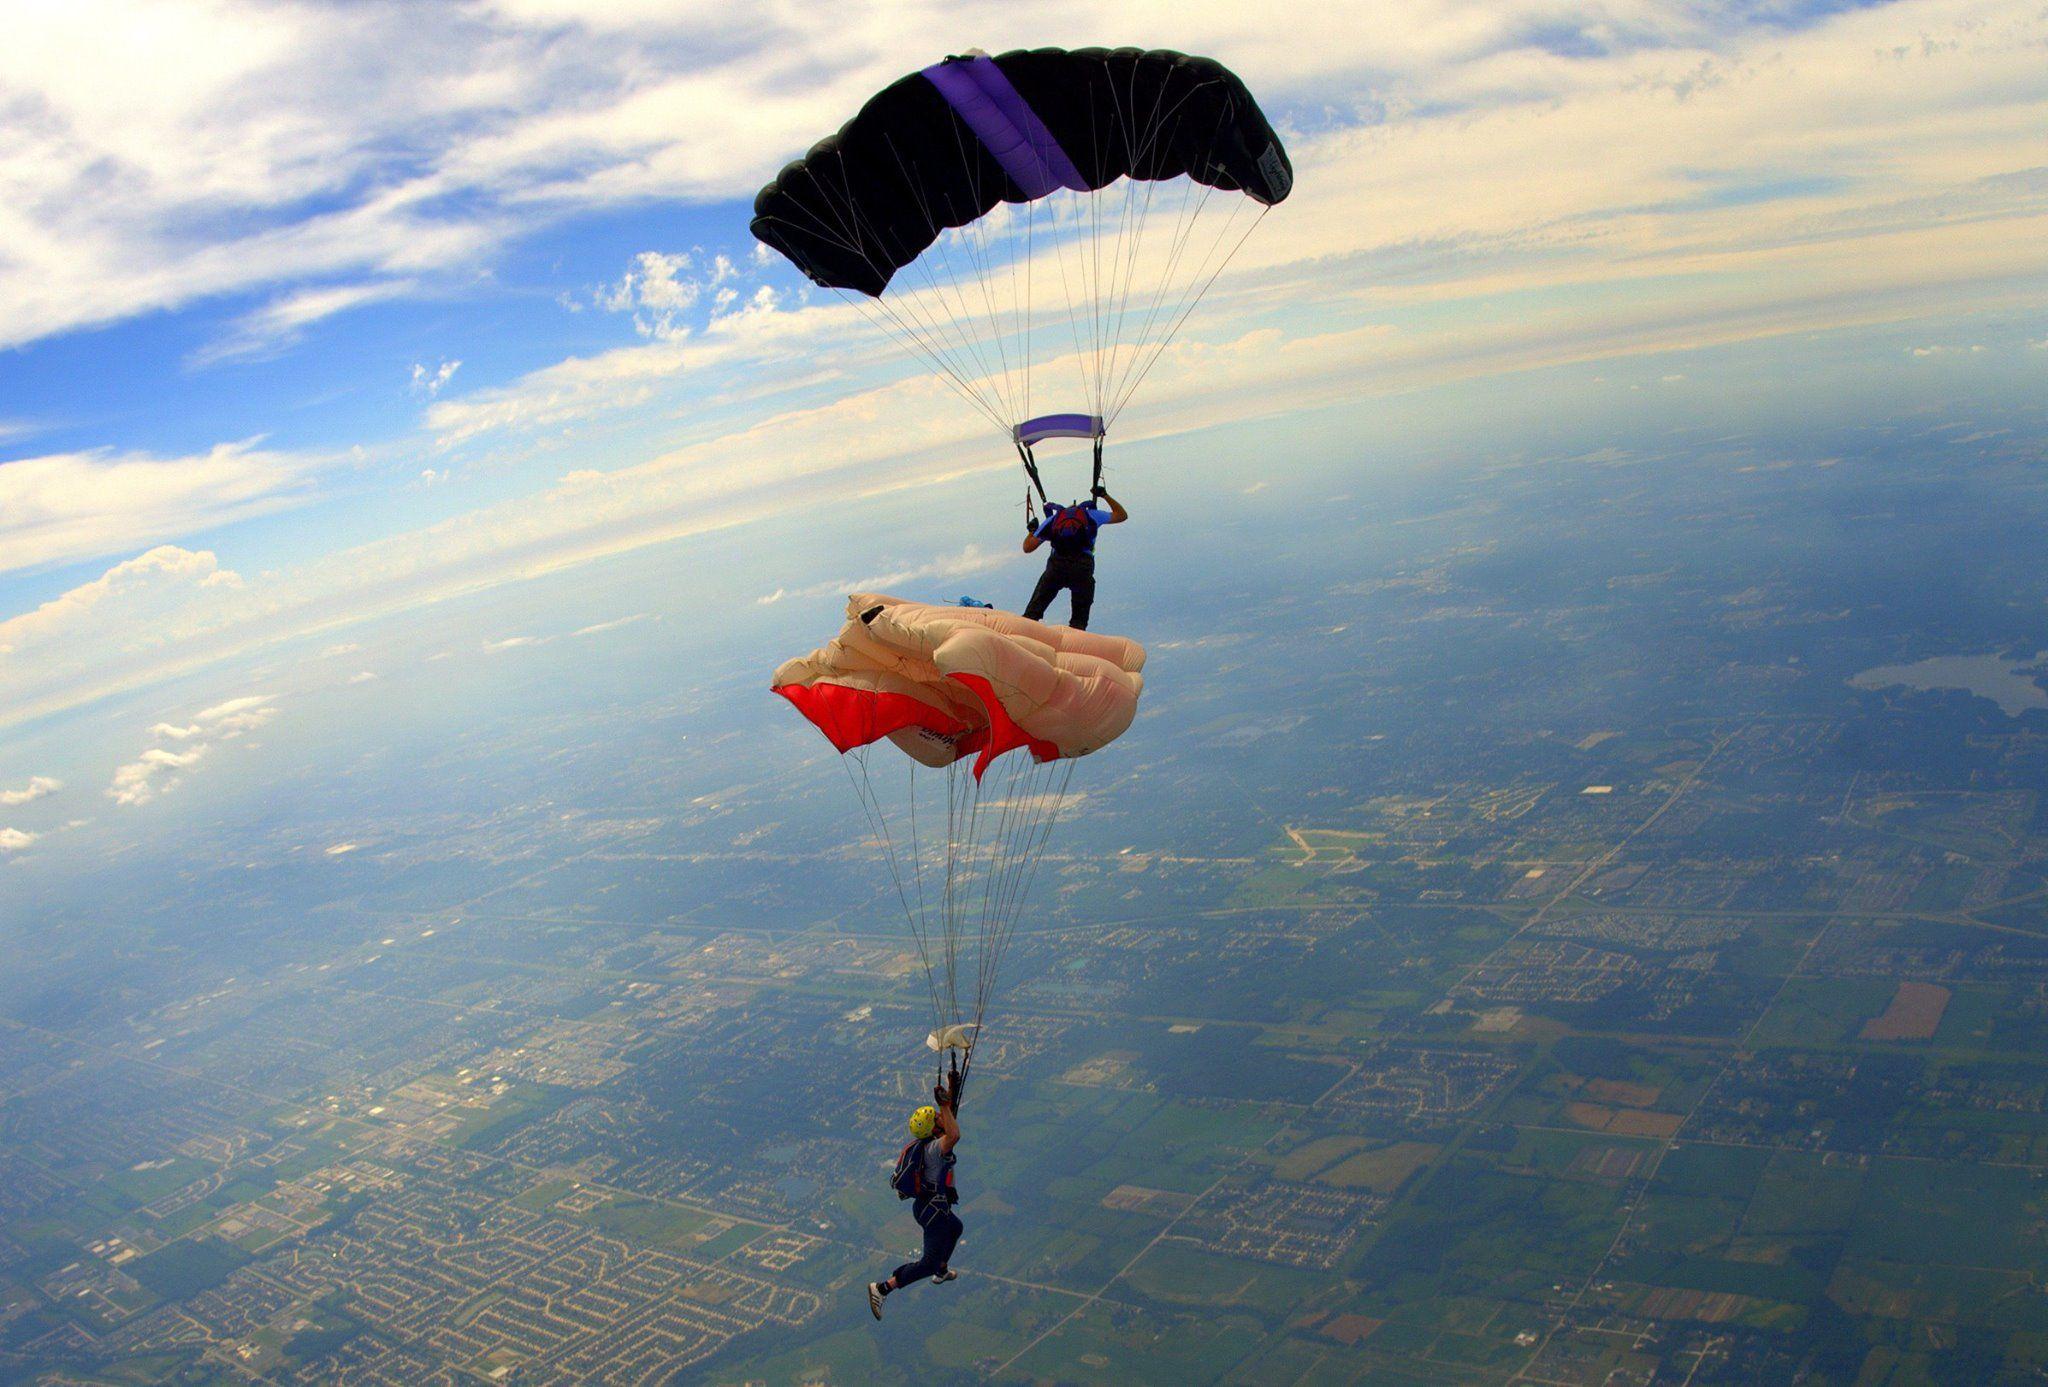 Parachuting barred in Florida